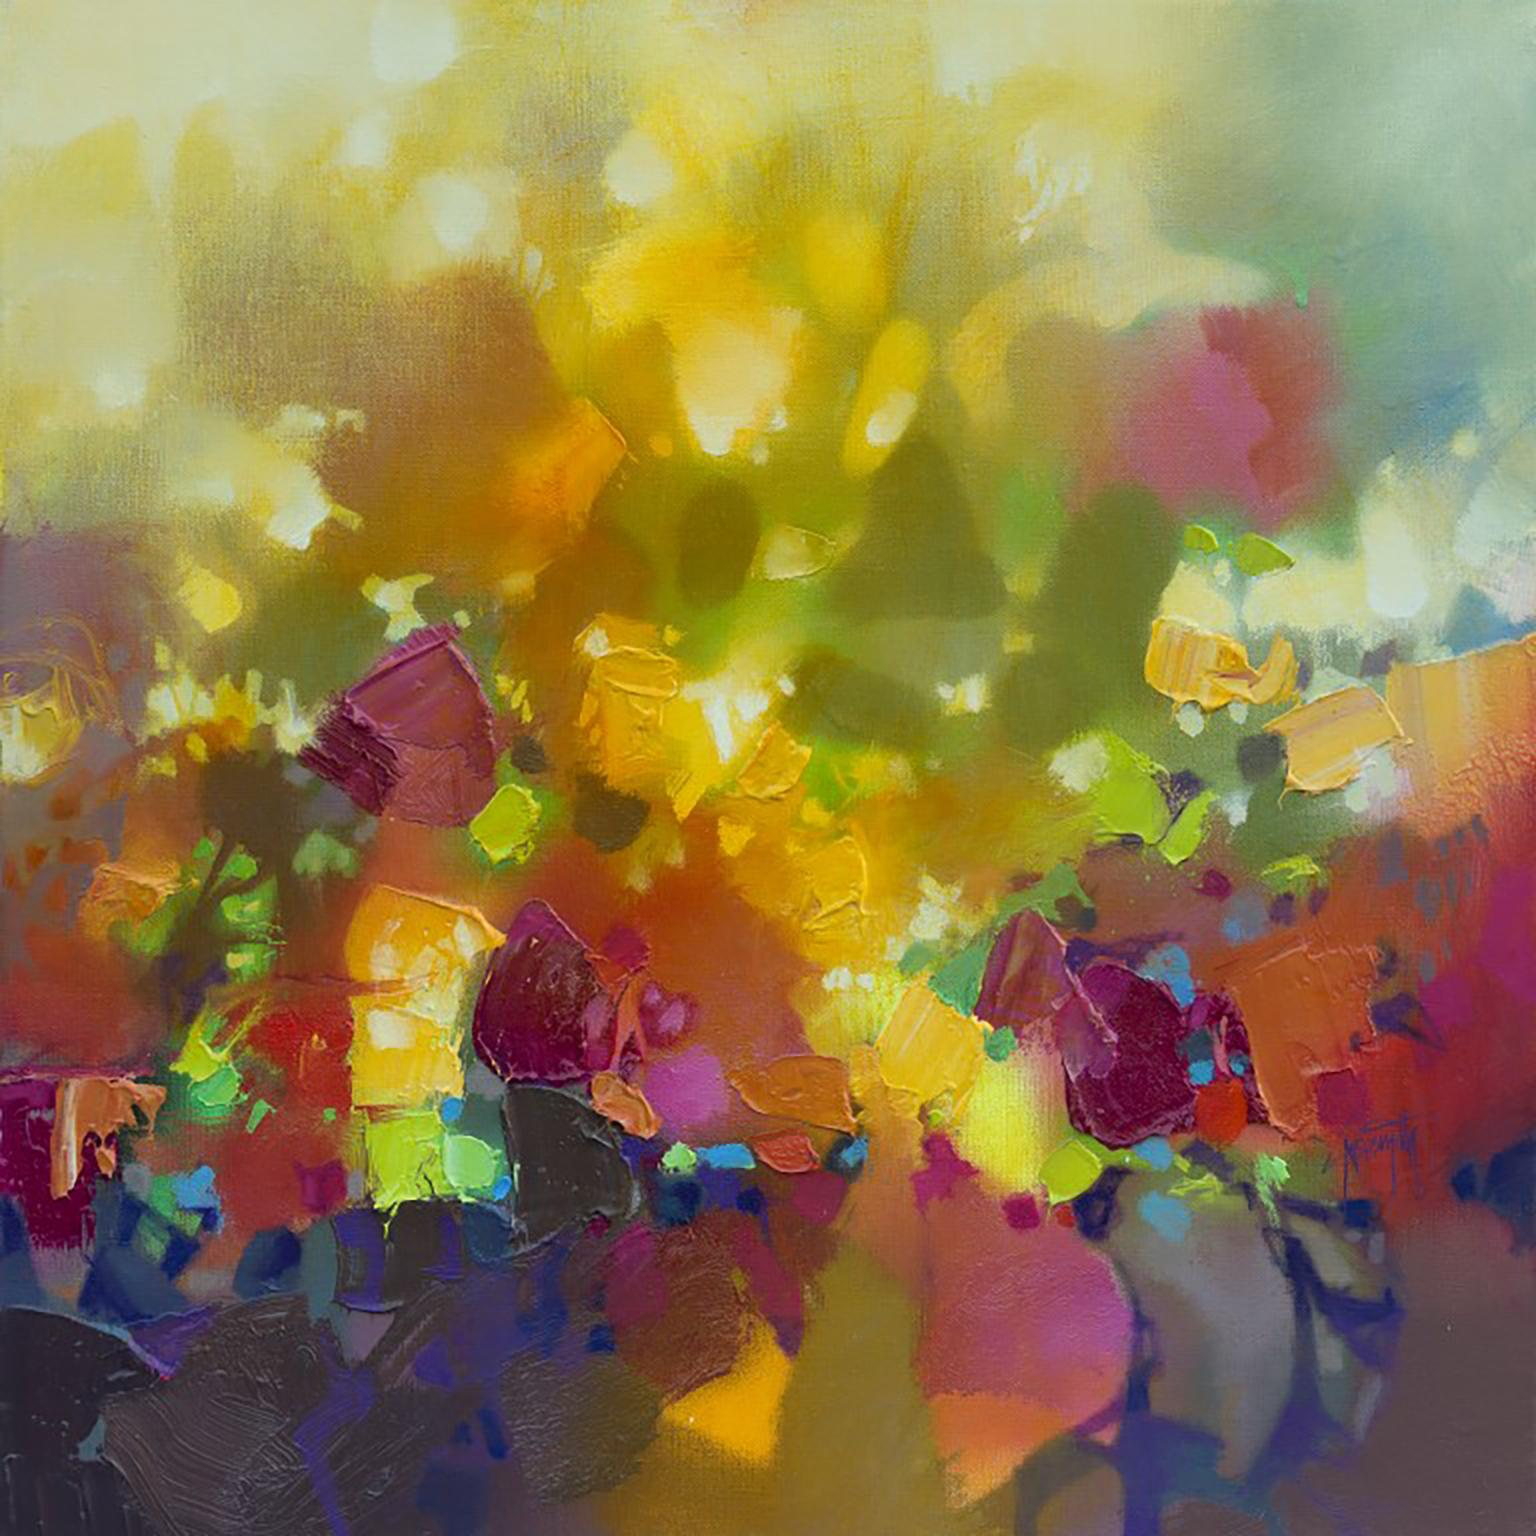 Light Permeates - 21st Century, Contemporary, Figurative, Spray Paint, Oil